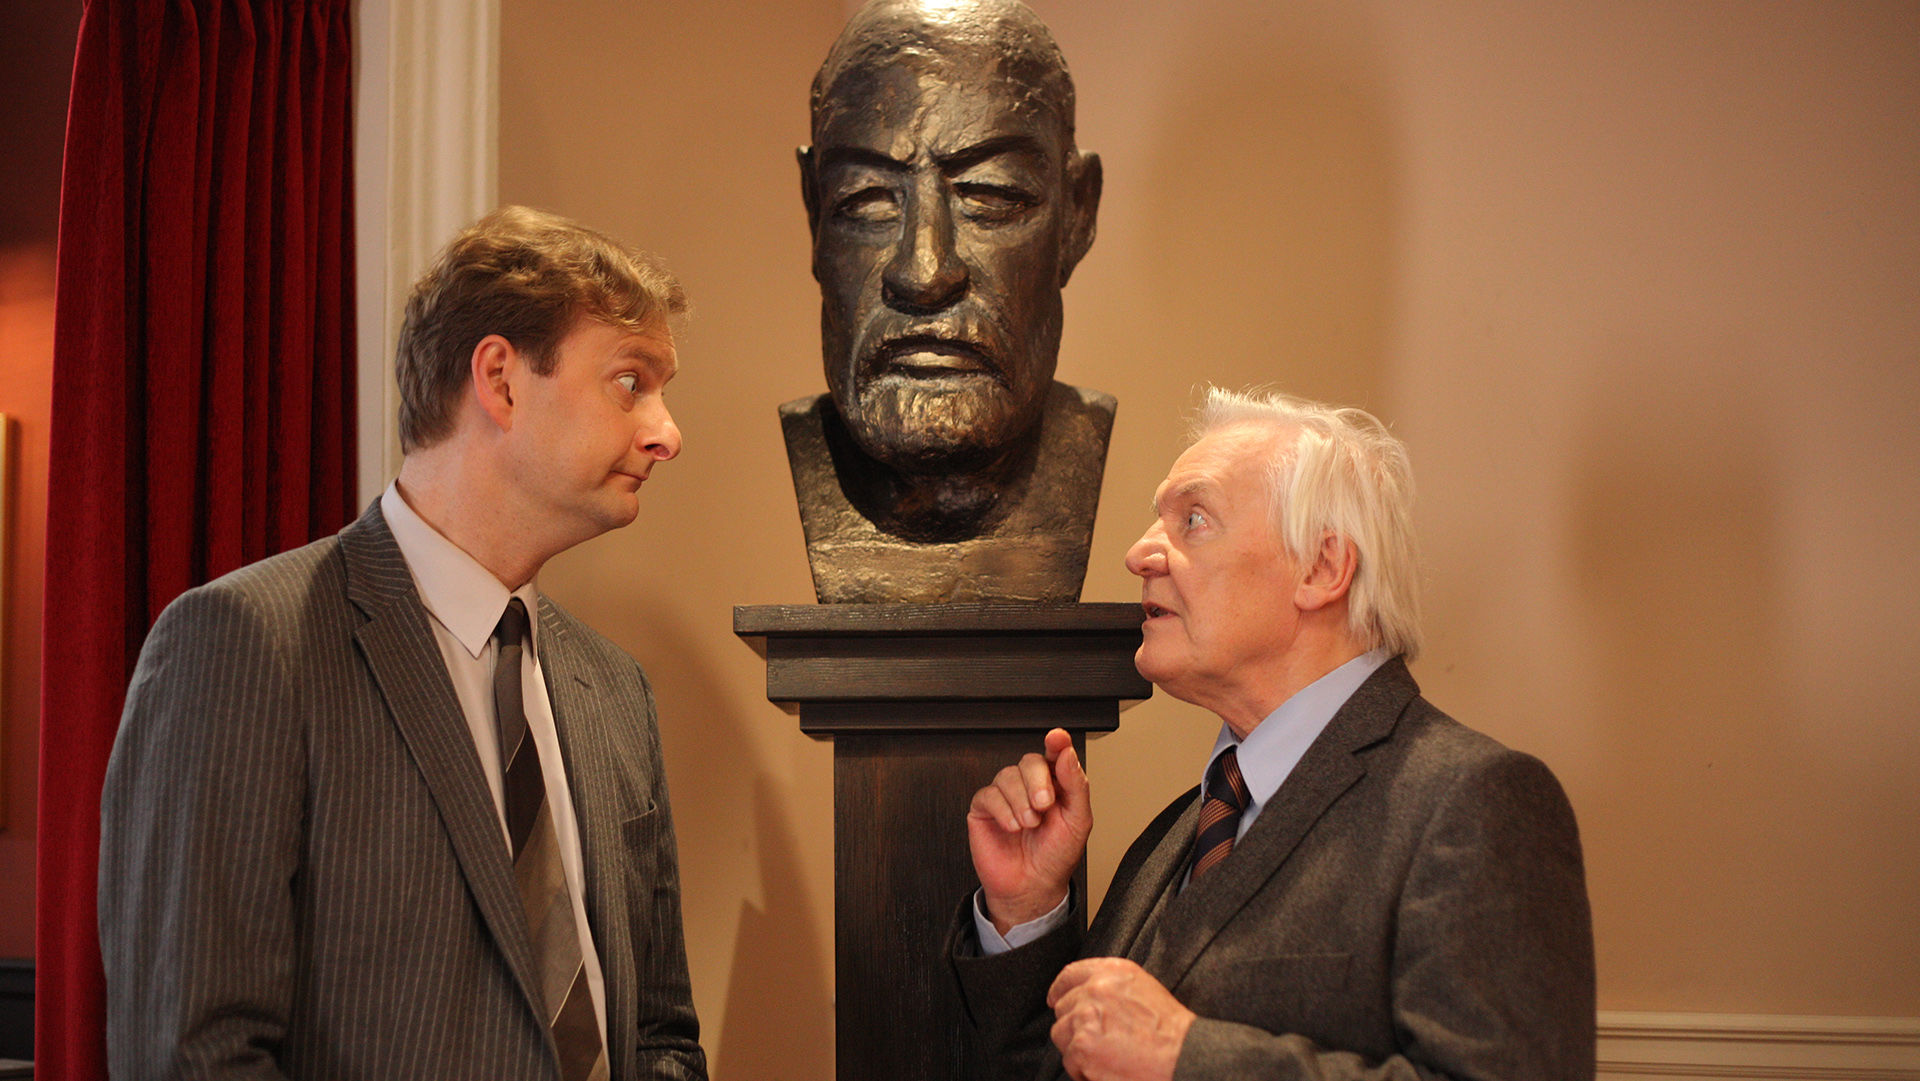 Alexander Jagsch (Dr. Sigmund Leidowitz), Wolfgang Hübsch (Psychotherapeut Dr. Gustav Alt)